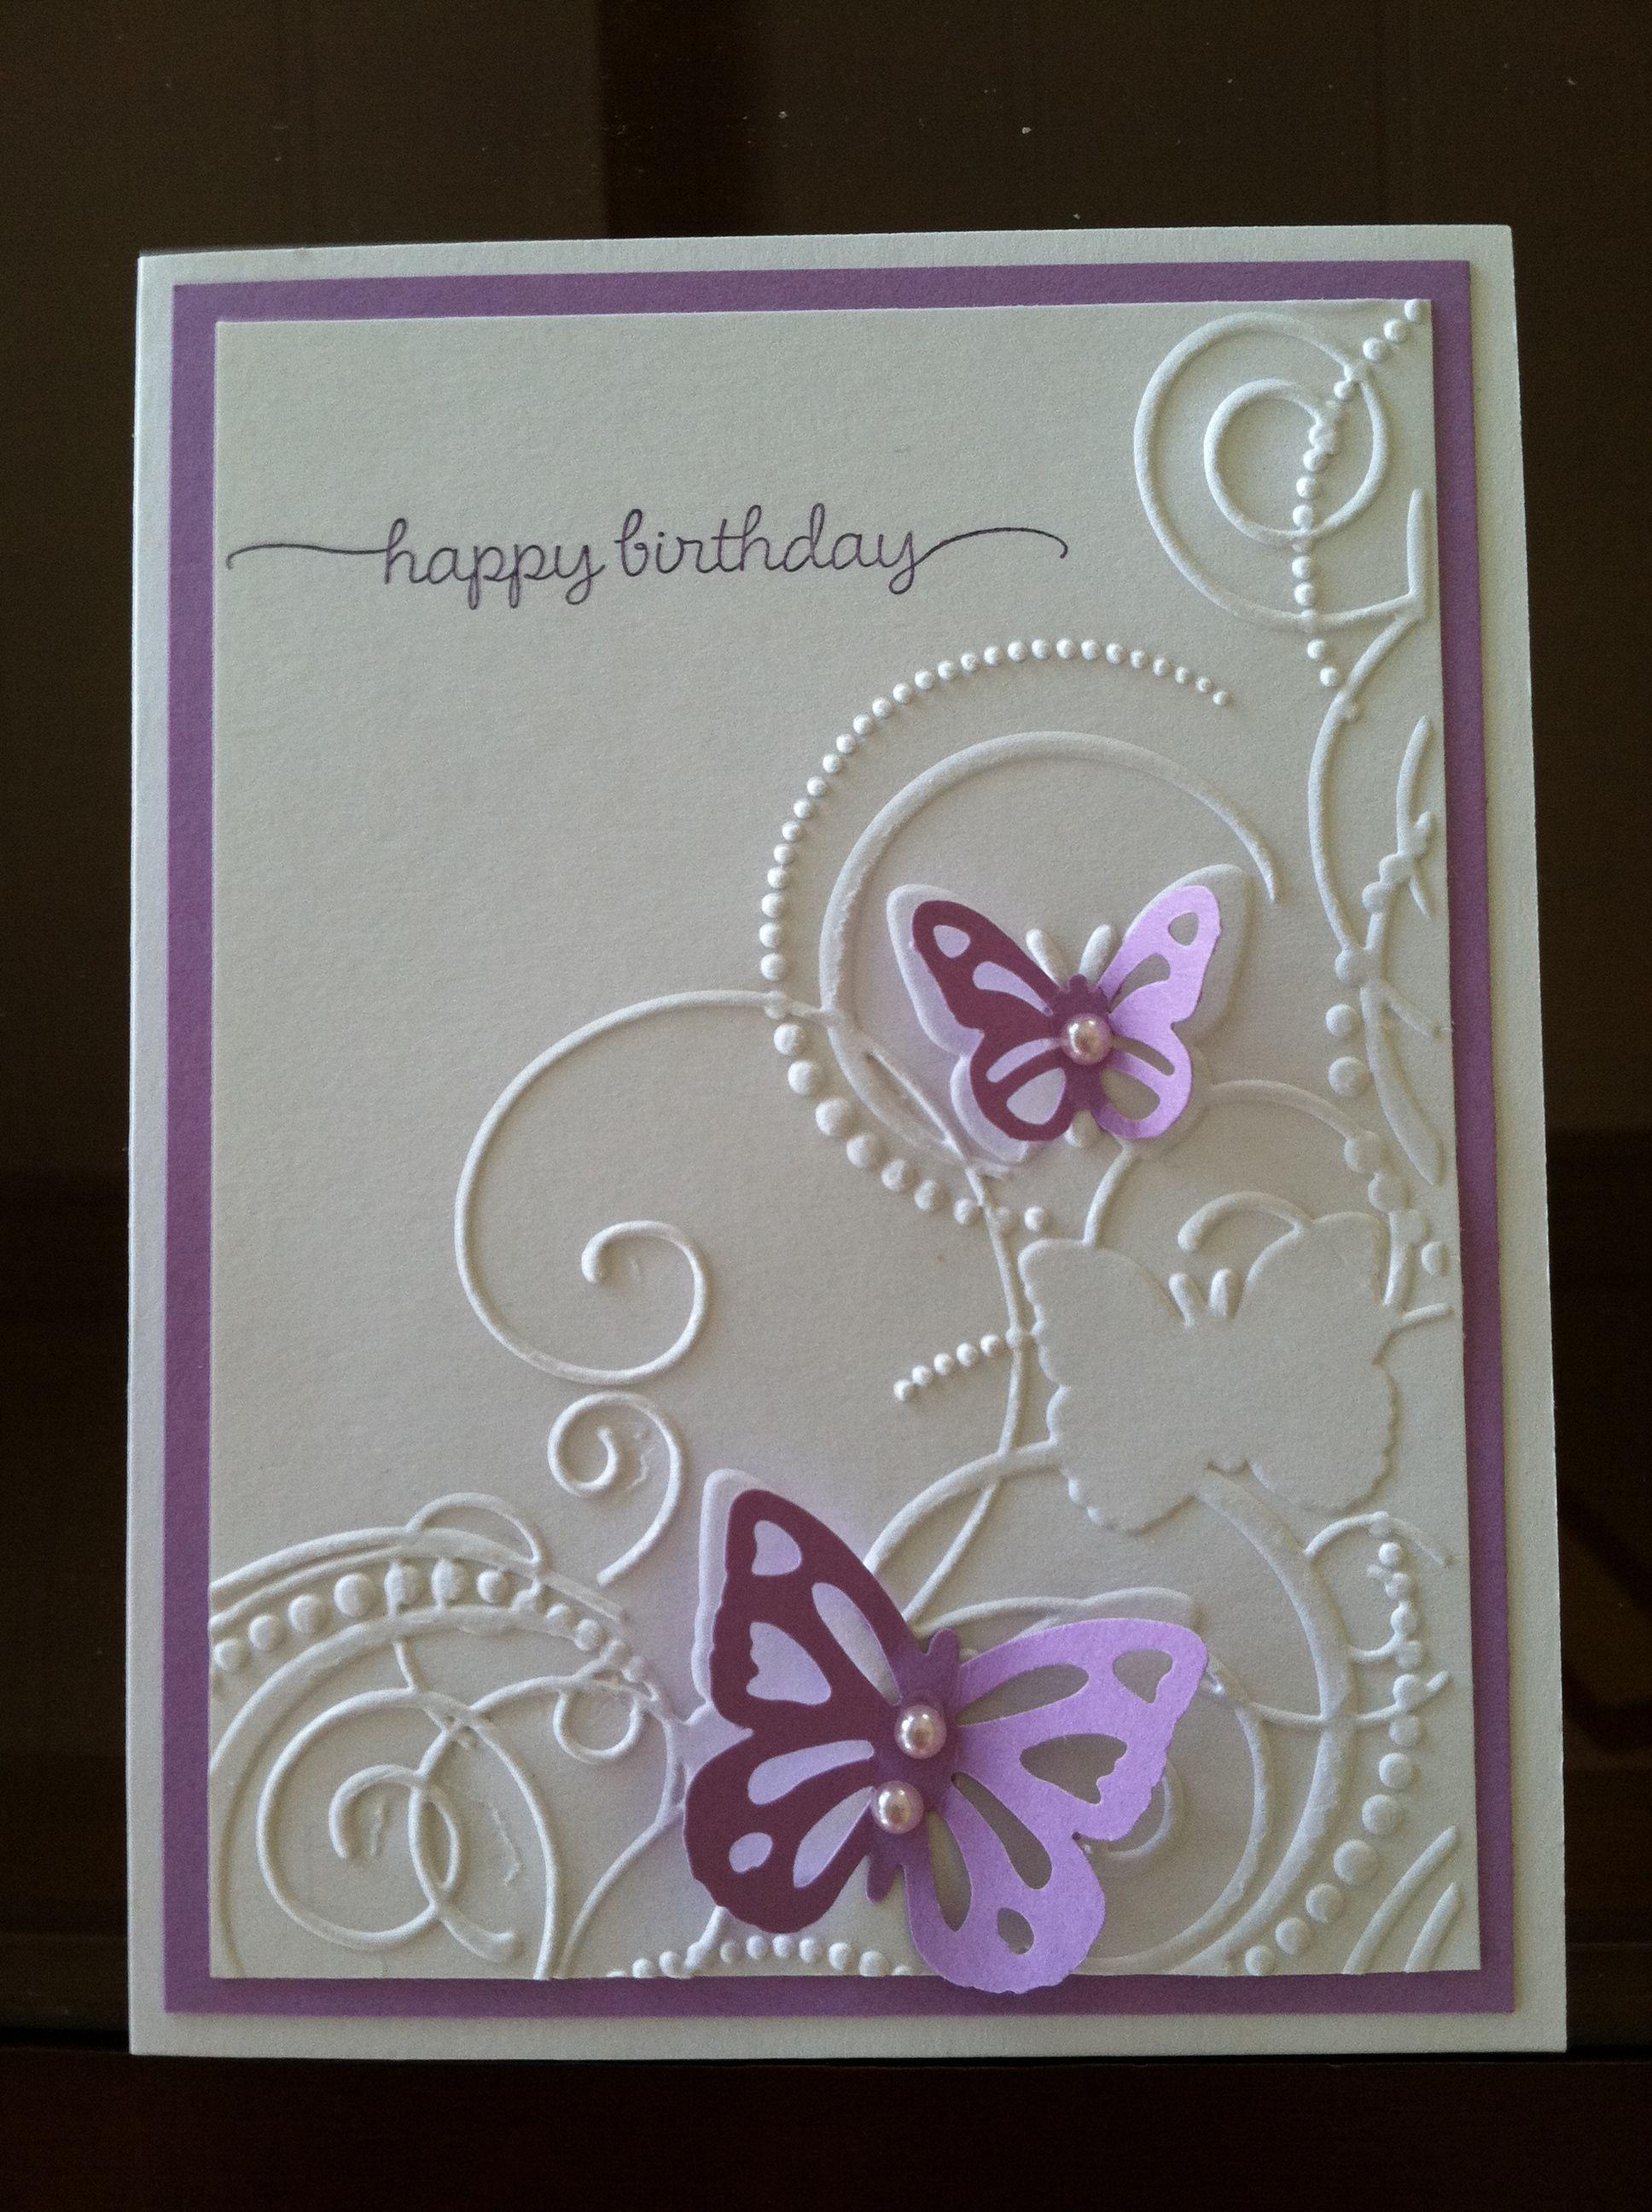 handmade birthday card from Ladybug Designs black and white